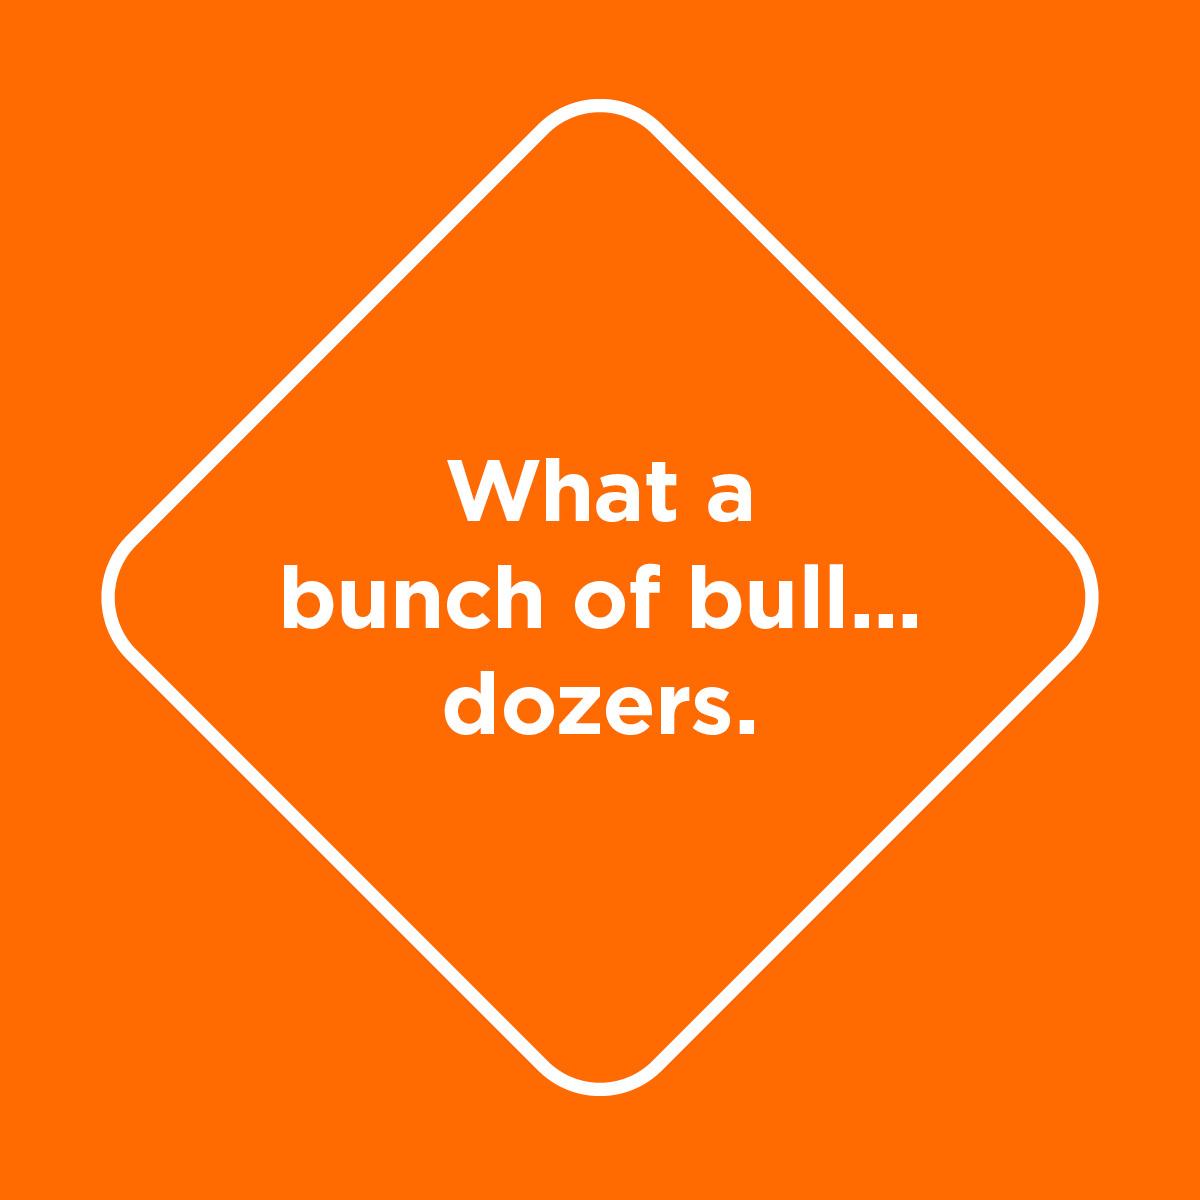 What_a_bunch_of_bull_dozers.jpg